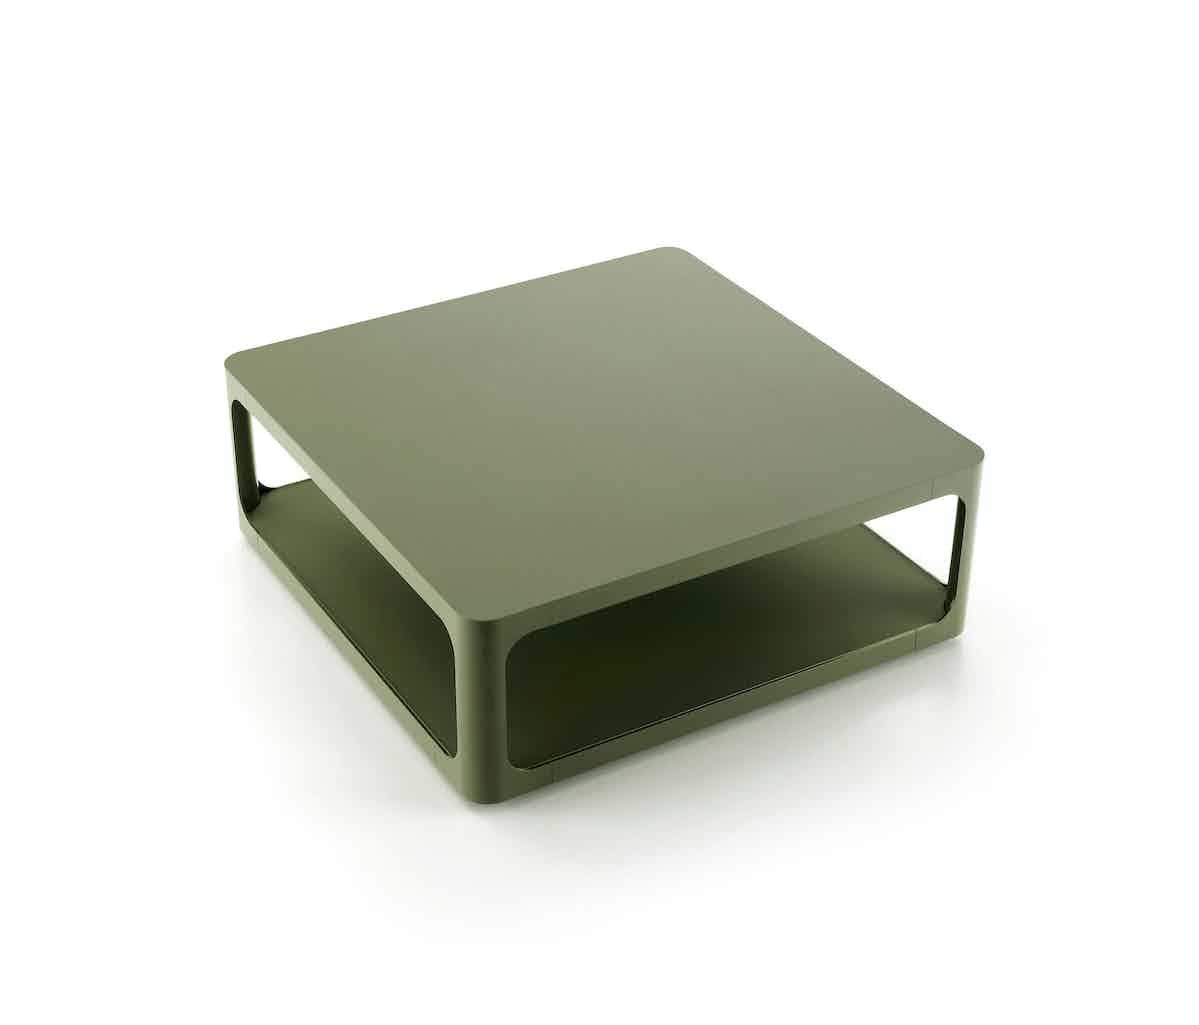 Rimadesio Olive Green Square Coffee Table Haute Living